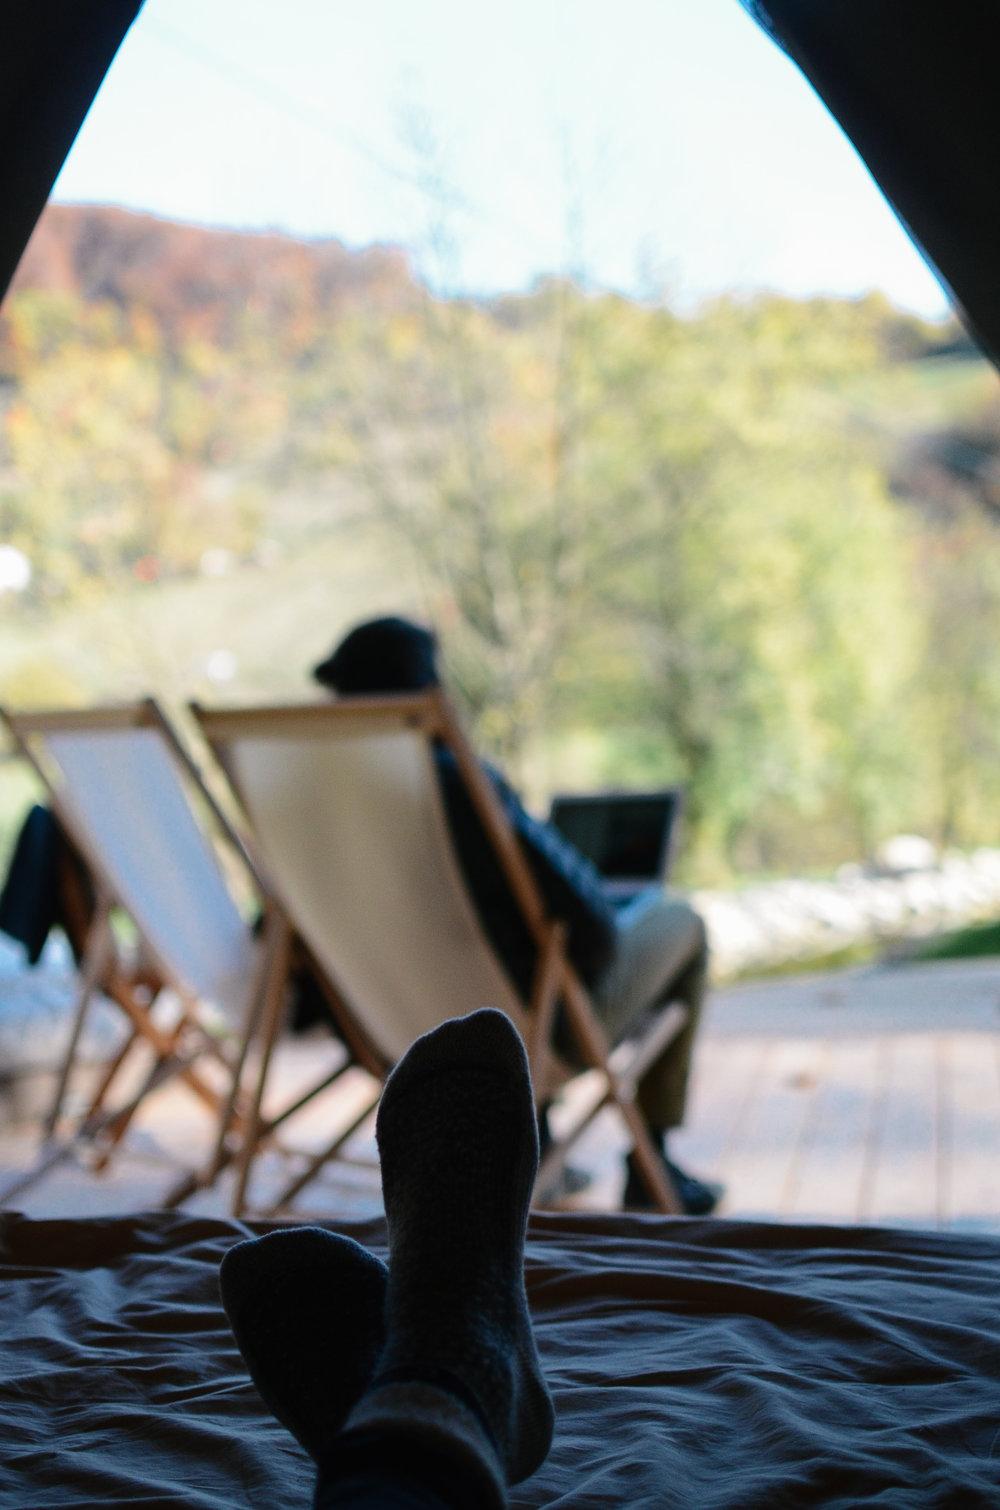 slovenia-travel-glamping-chateau-ramsak_DSC_2495.jpg